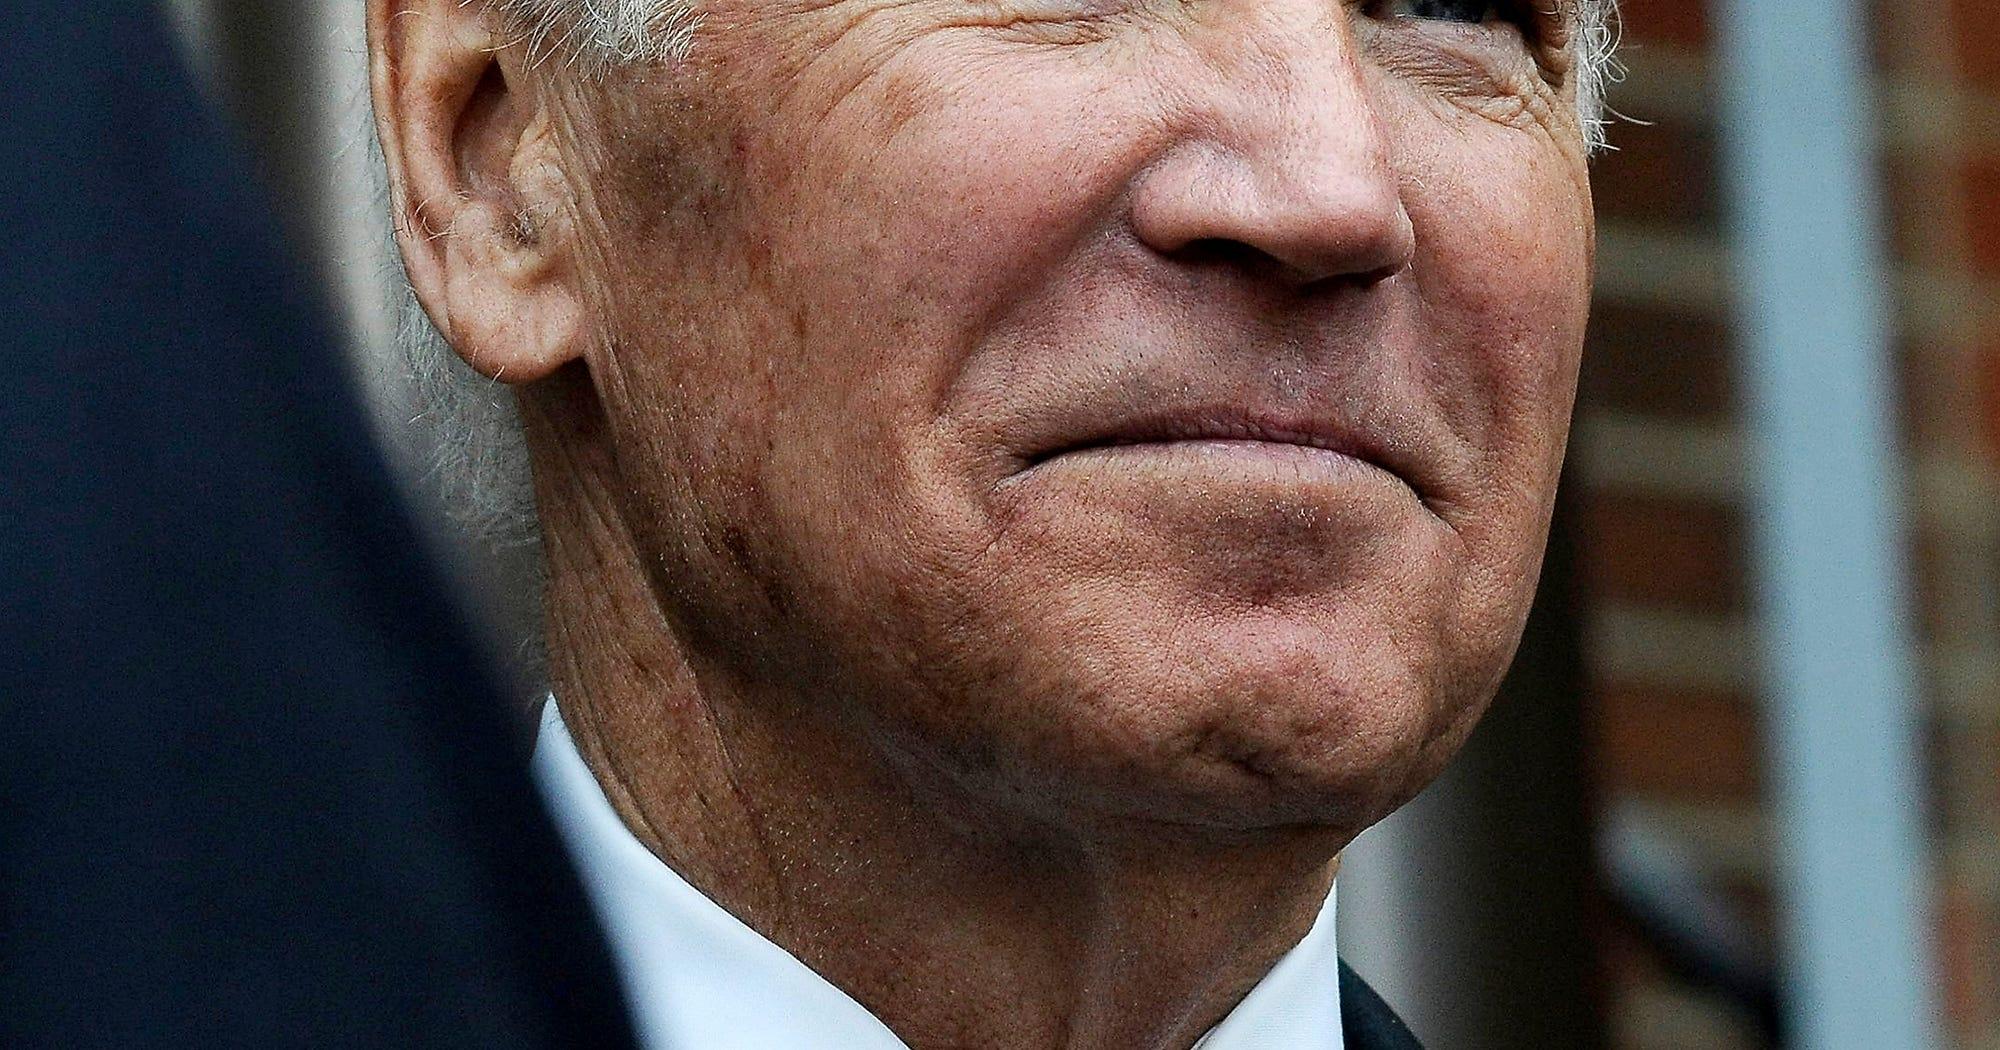 Joe Biden Just Defined Rape For College Guys